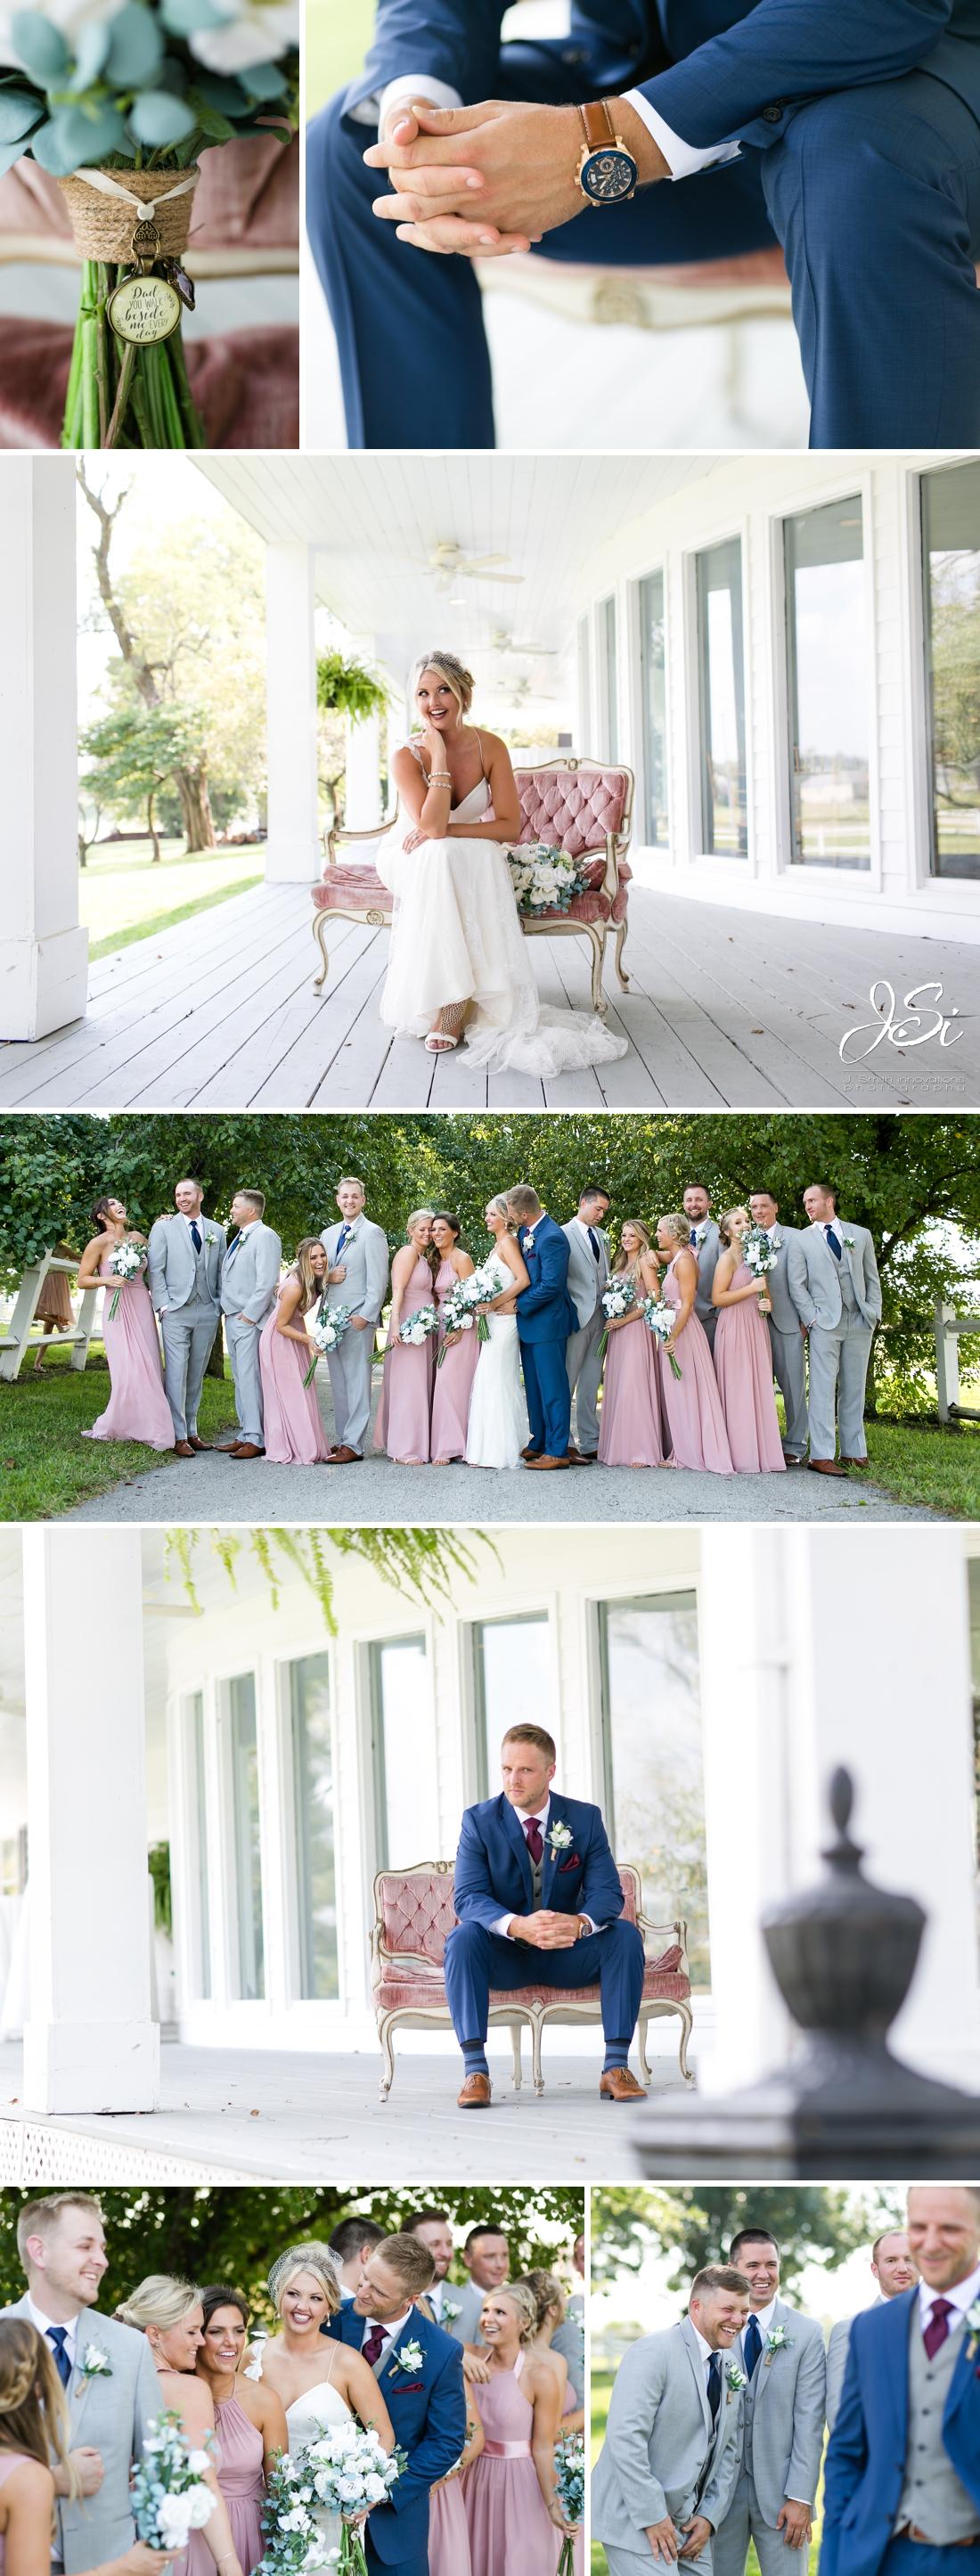 Kansas City Executive Hills Polo Club cheerful joyful wedding story photo